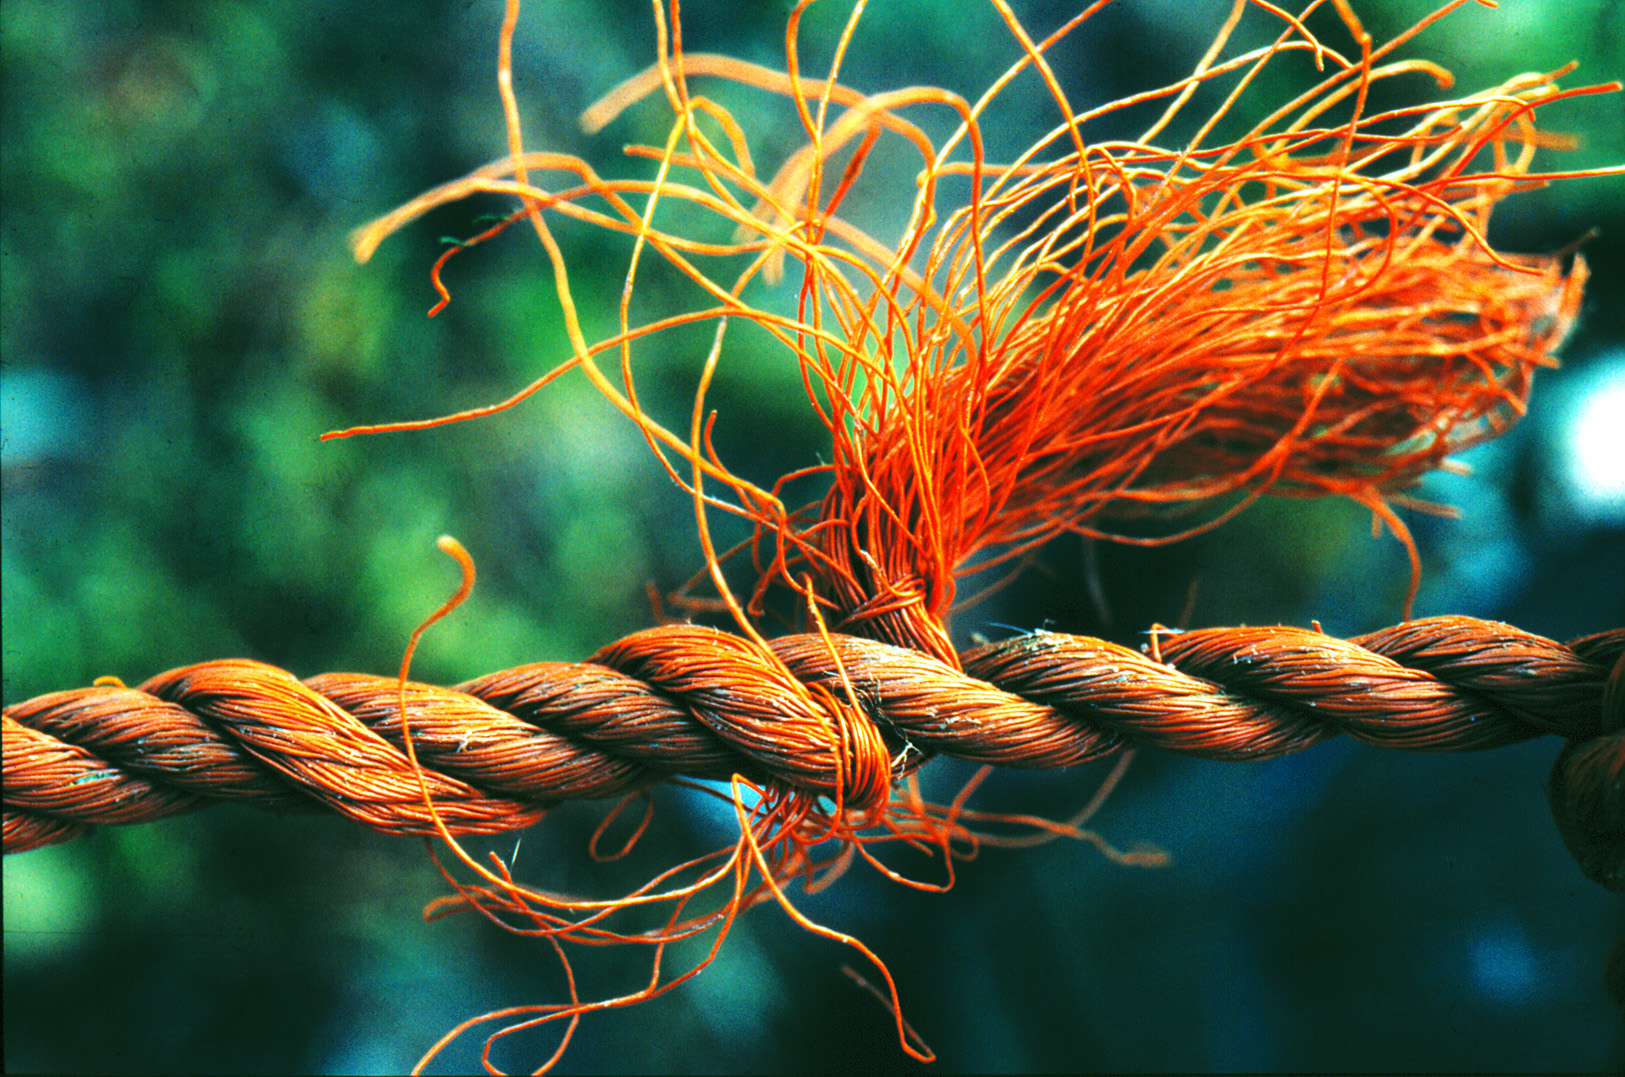 der goldene Knoten